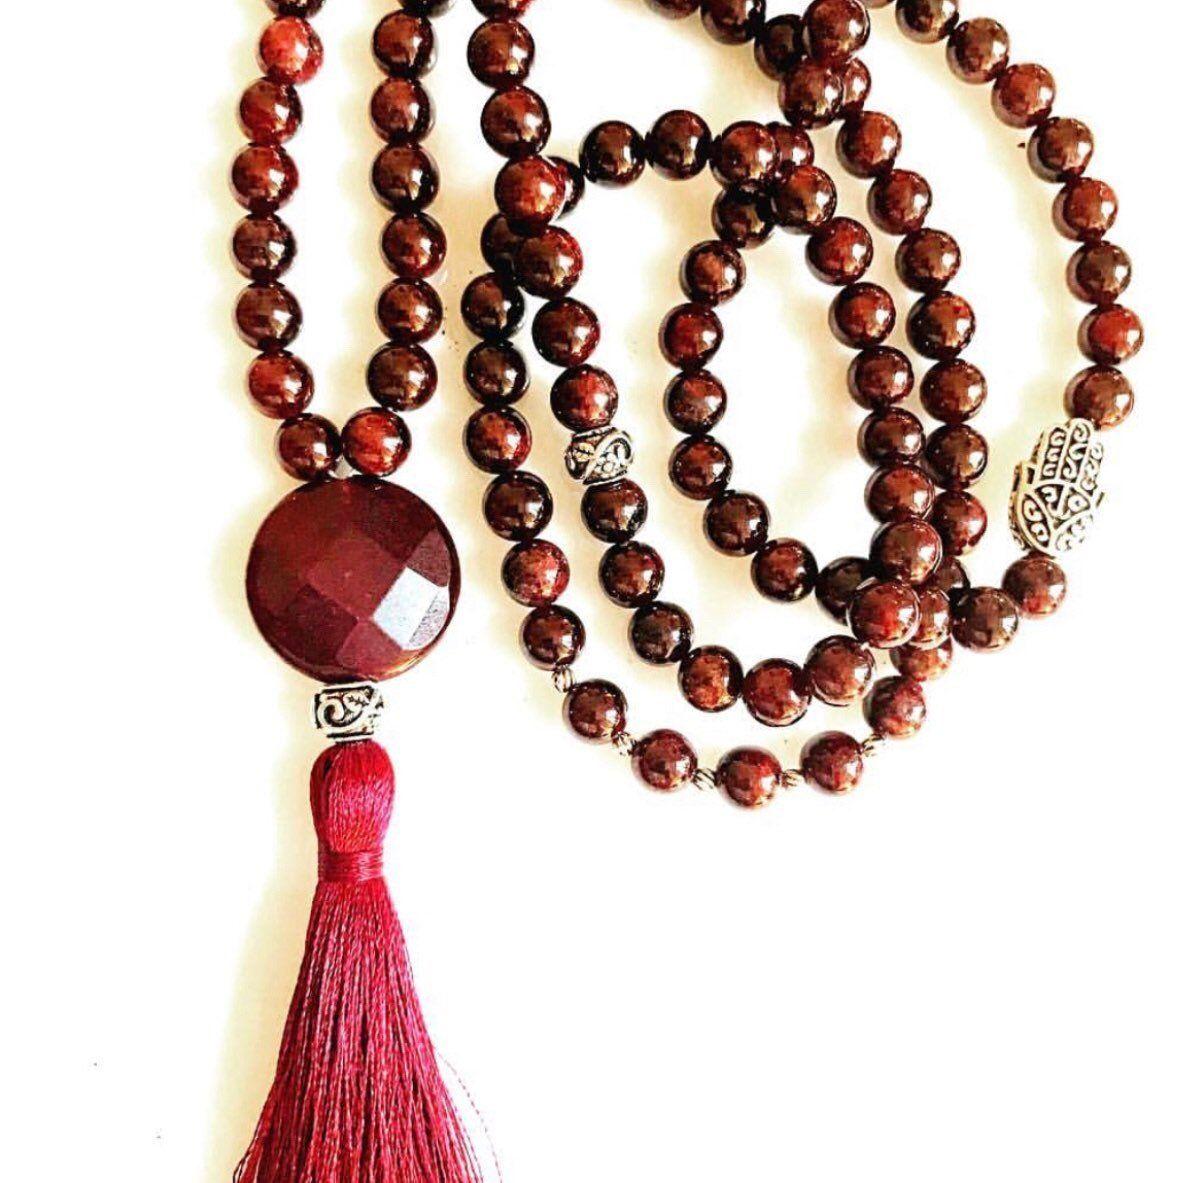 Carnelian Mala  Tassel Necklace  108 Mala Bead  Mala Bead  Mala Wood Necklace  Prayer Bead Necklace  Yoga Jewelry  Gift for Her